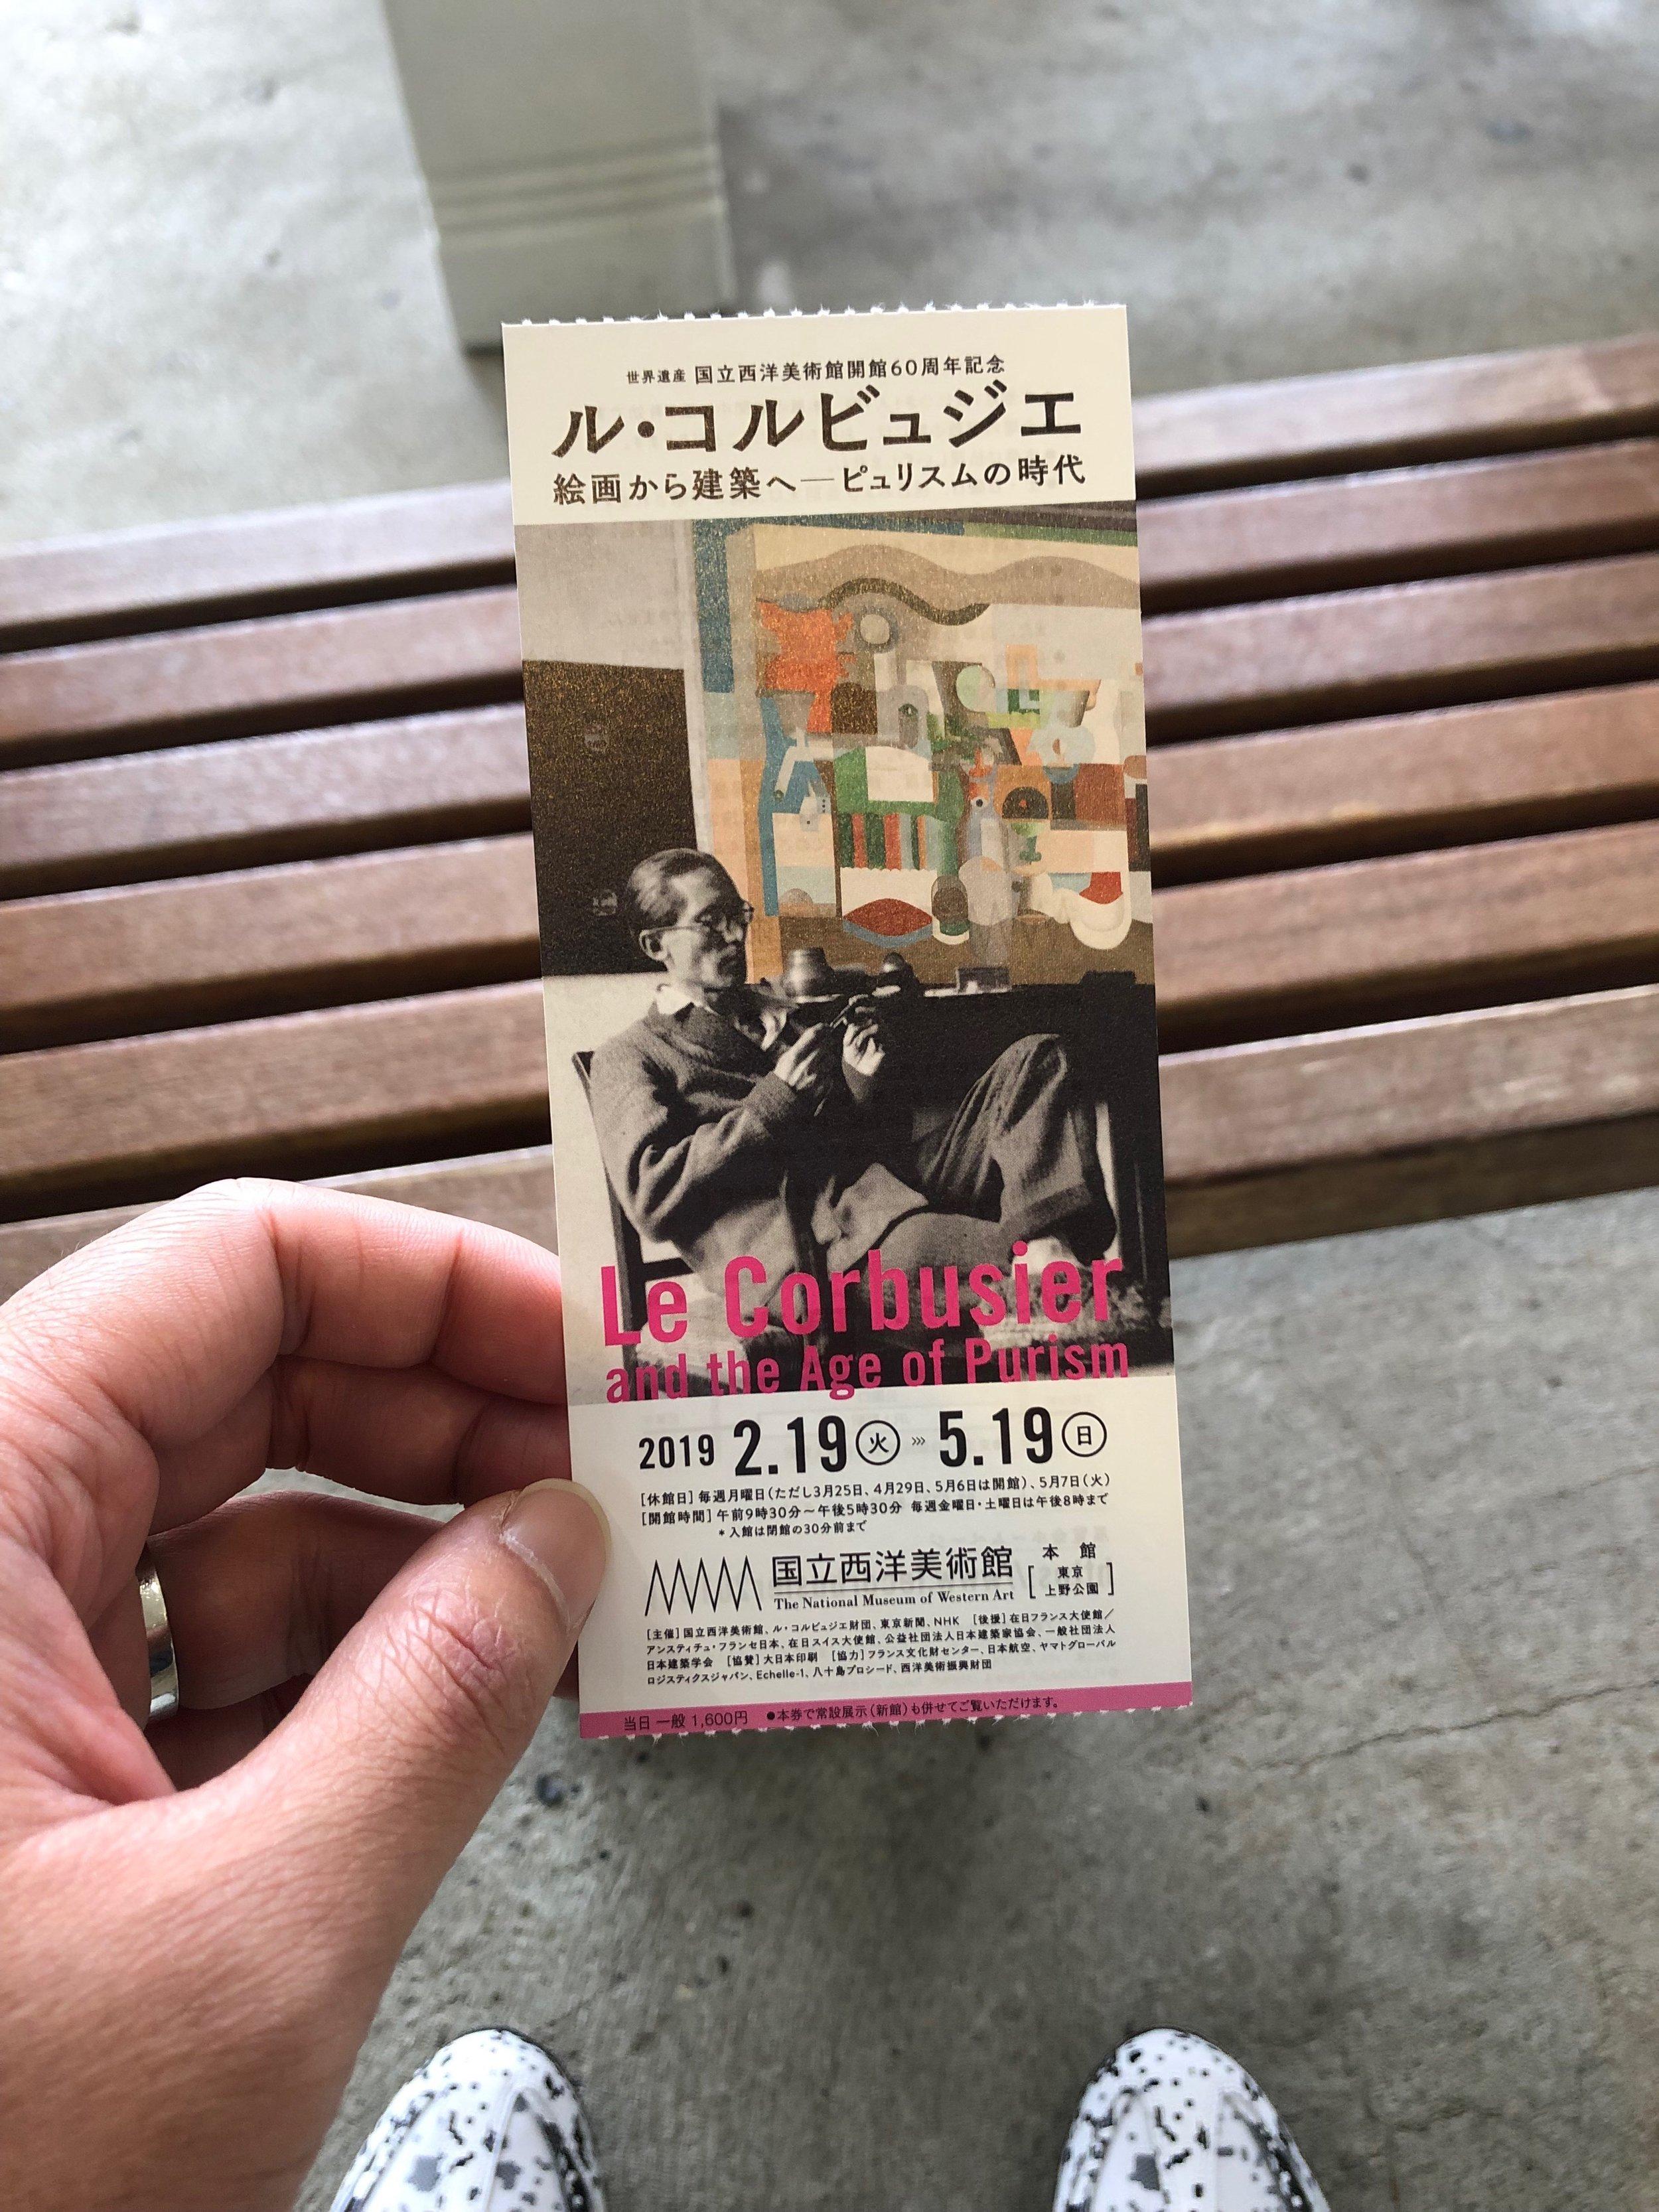 Le Corbusier exhibition in Ueno.